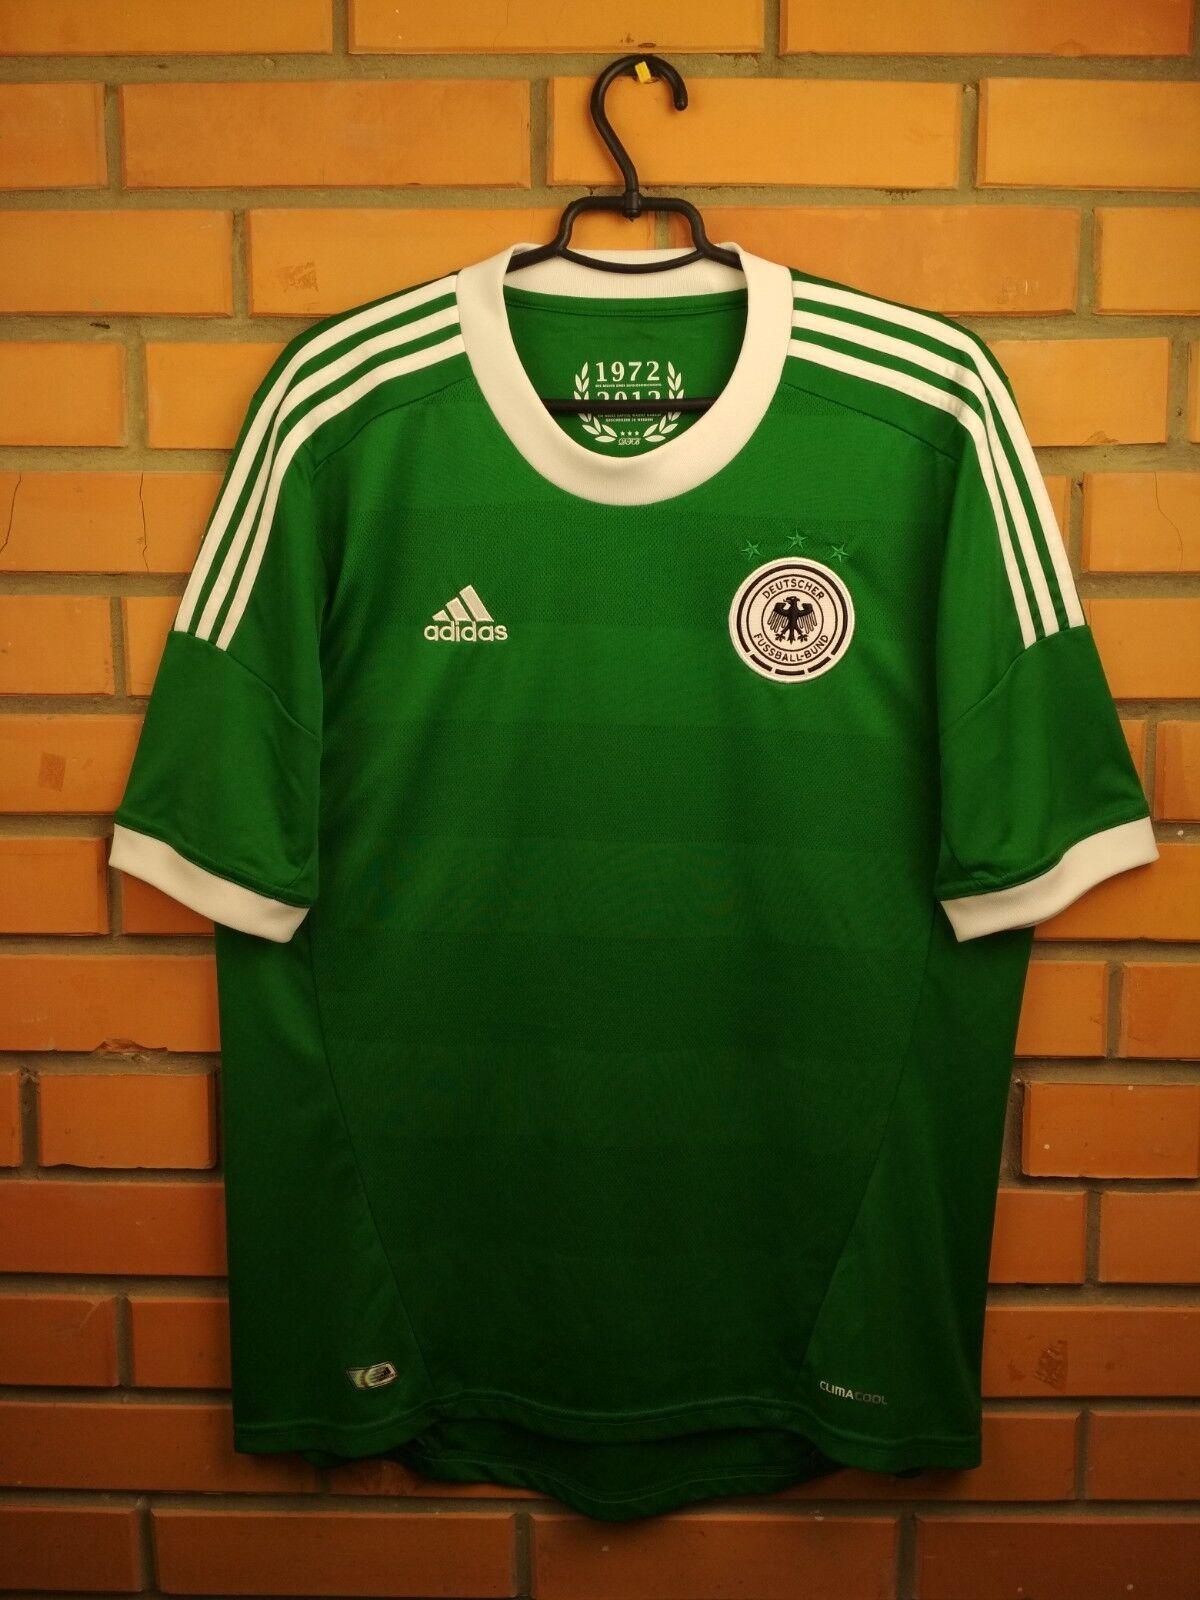 Alemania DFB Jersey Camisa Grande 2012 2013 lejos X21412 Fútbol Fútbol Adidas